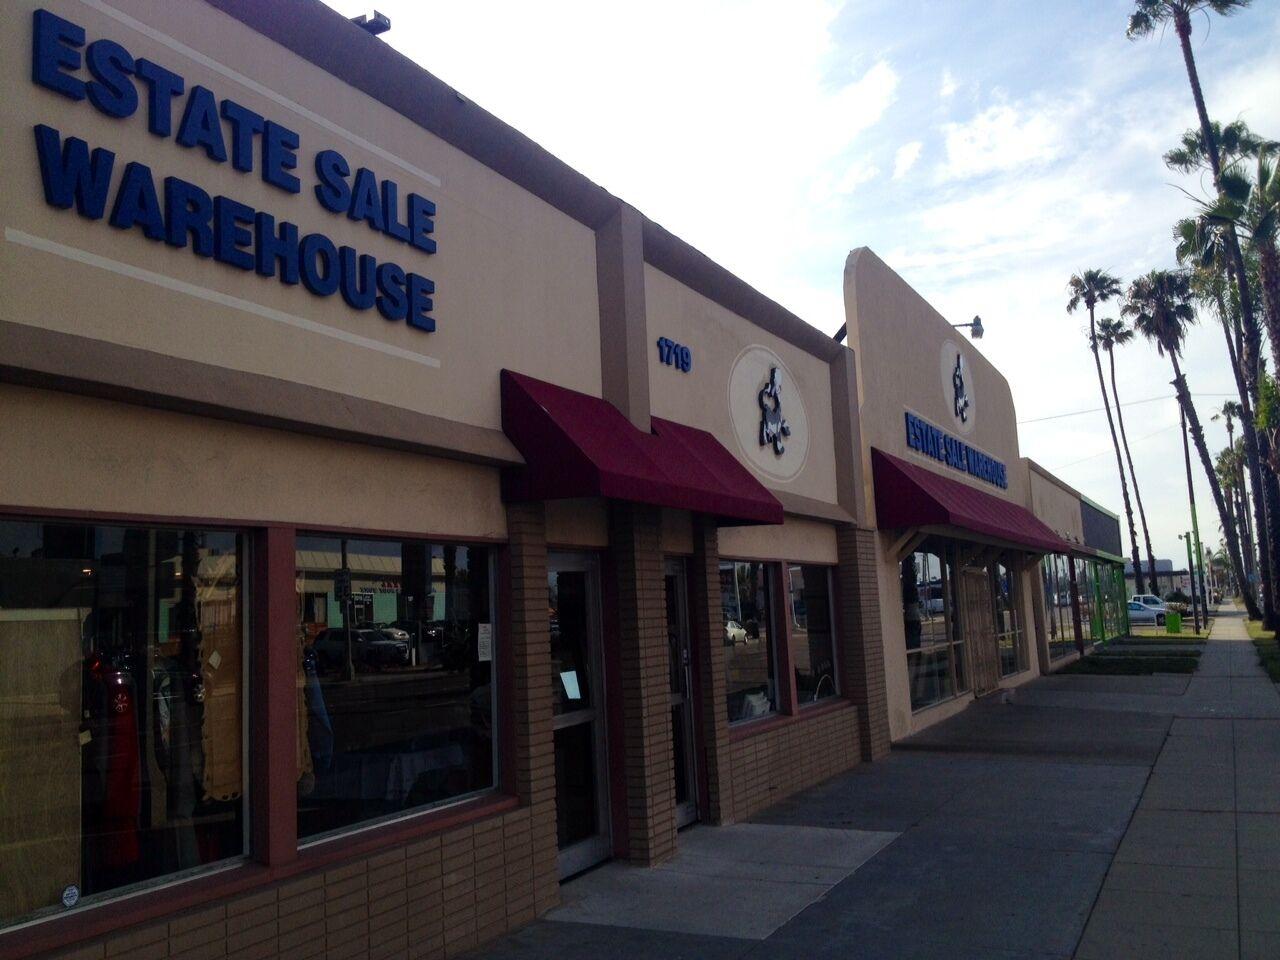 Estate Sale Warehouse